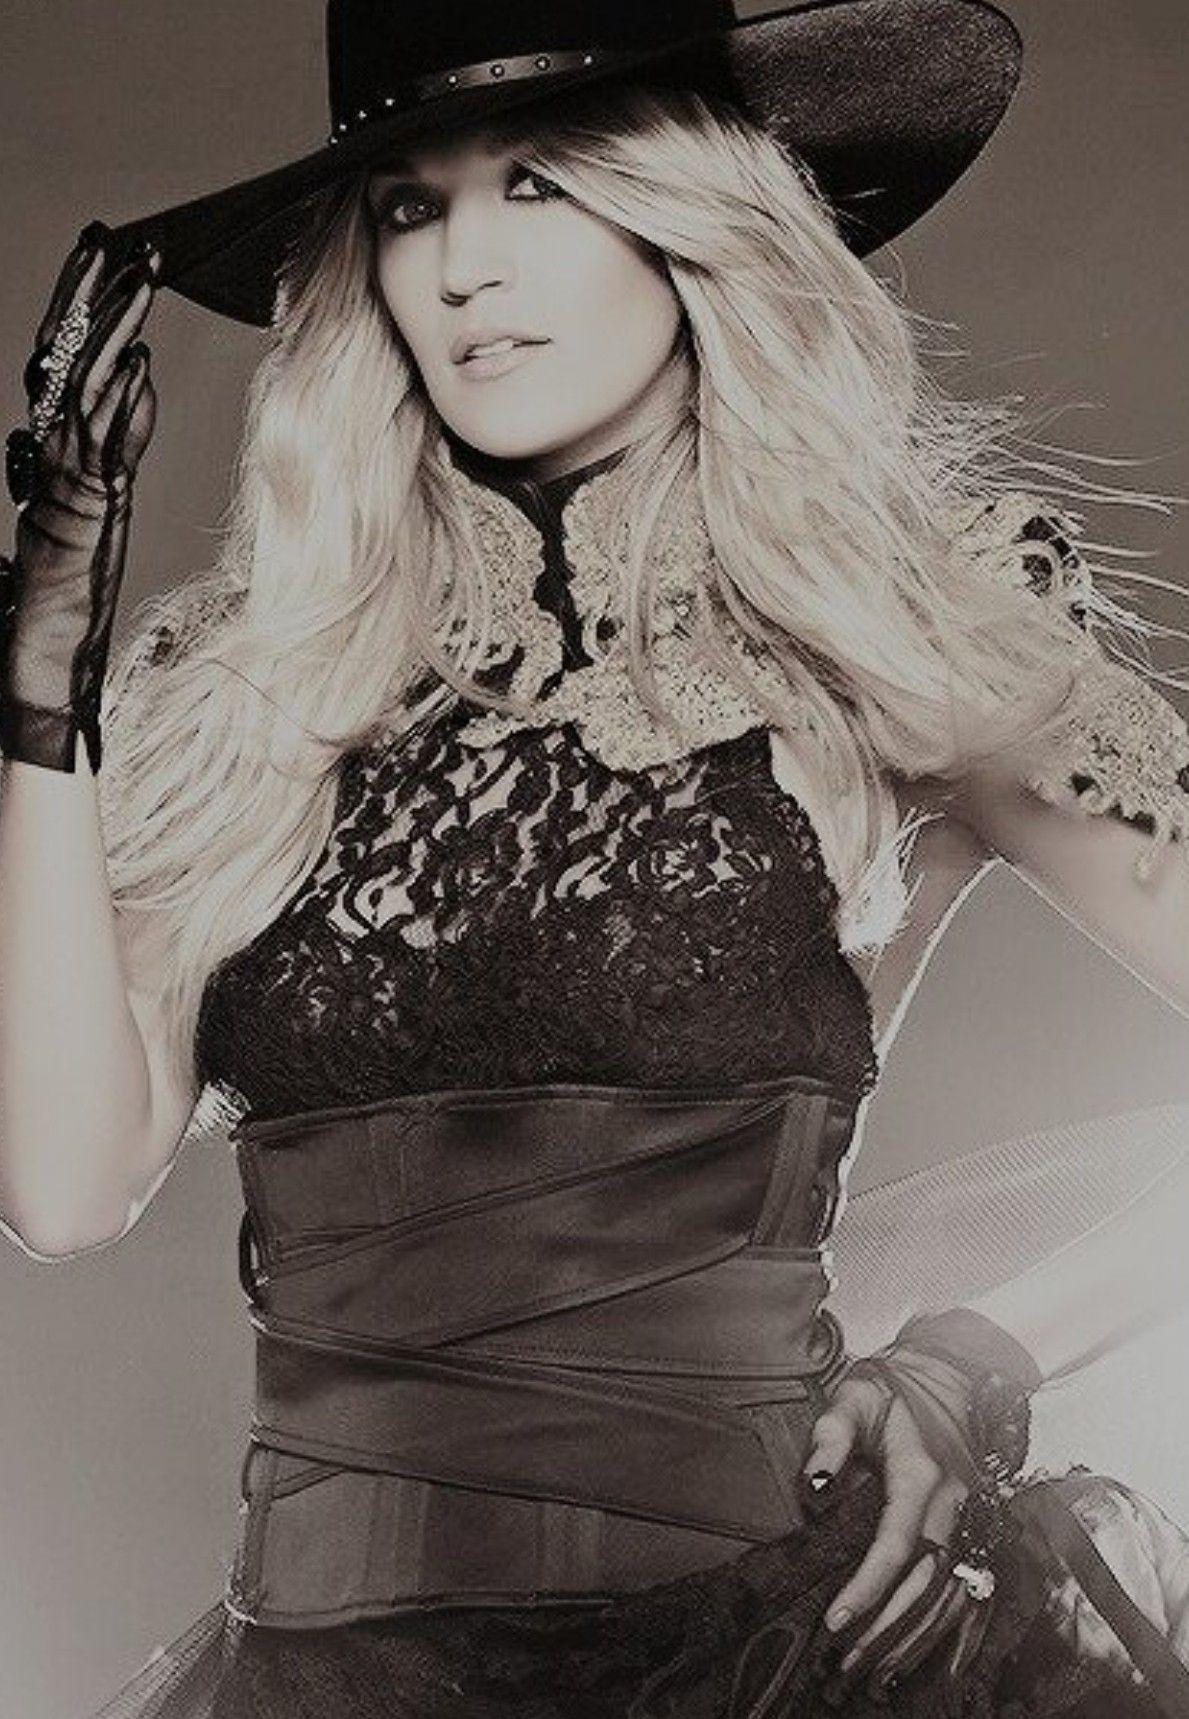 Carrie Underwood Carrie Carrie Underwood It S You In